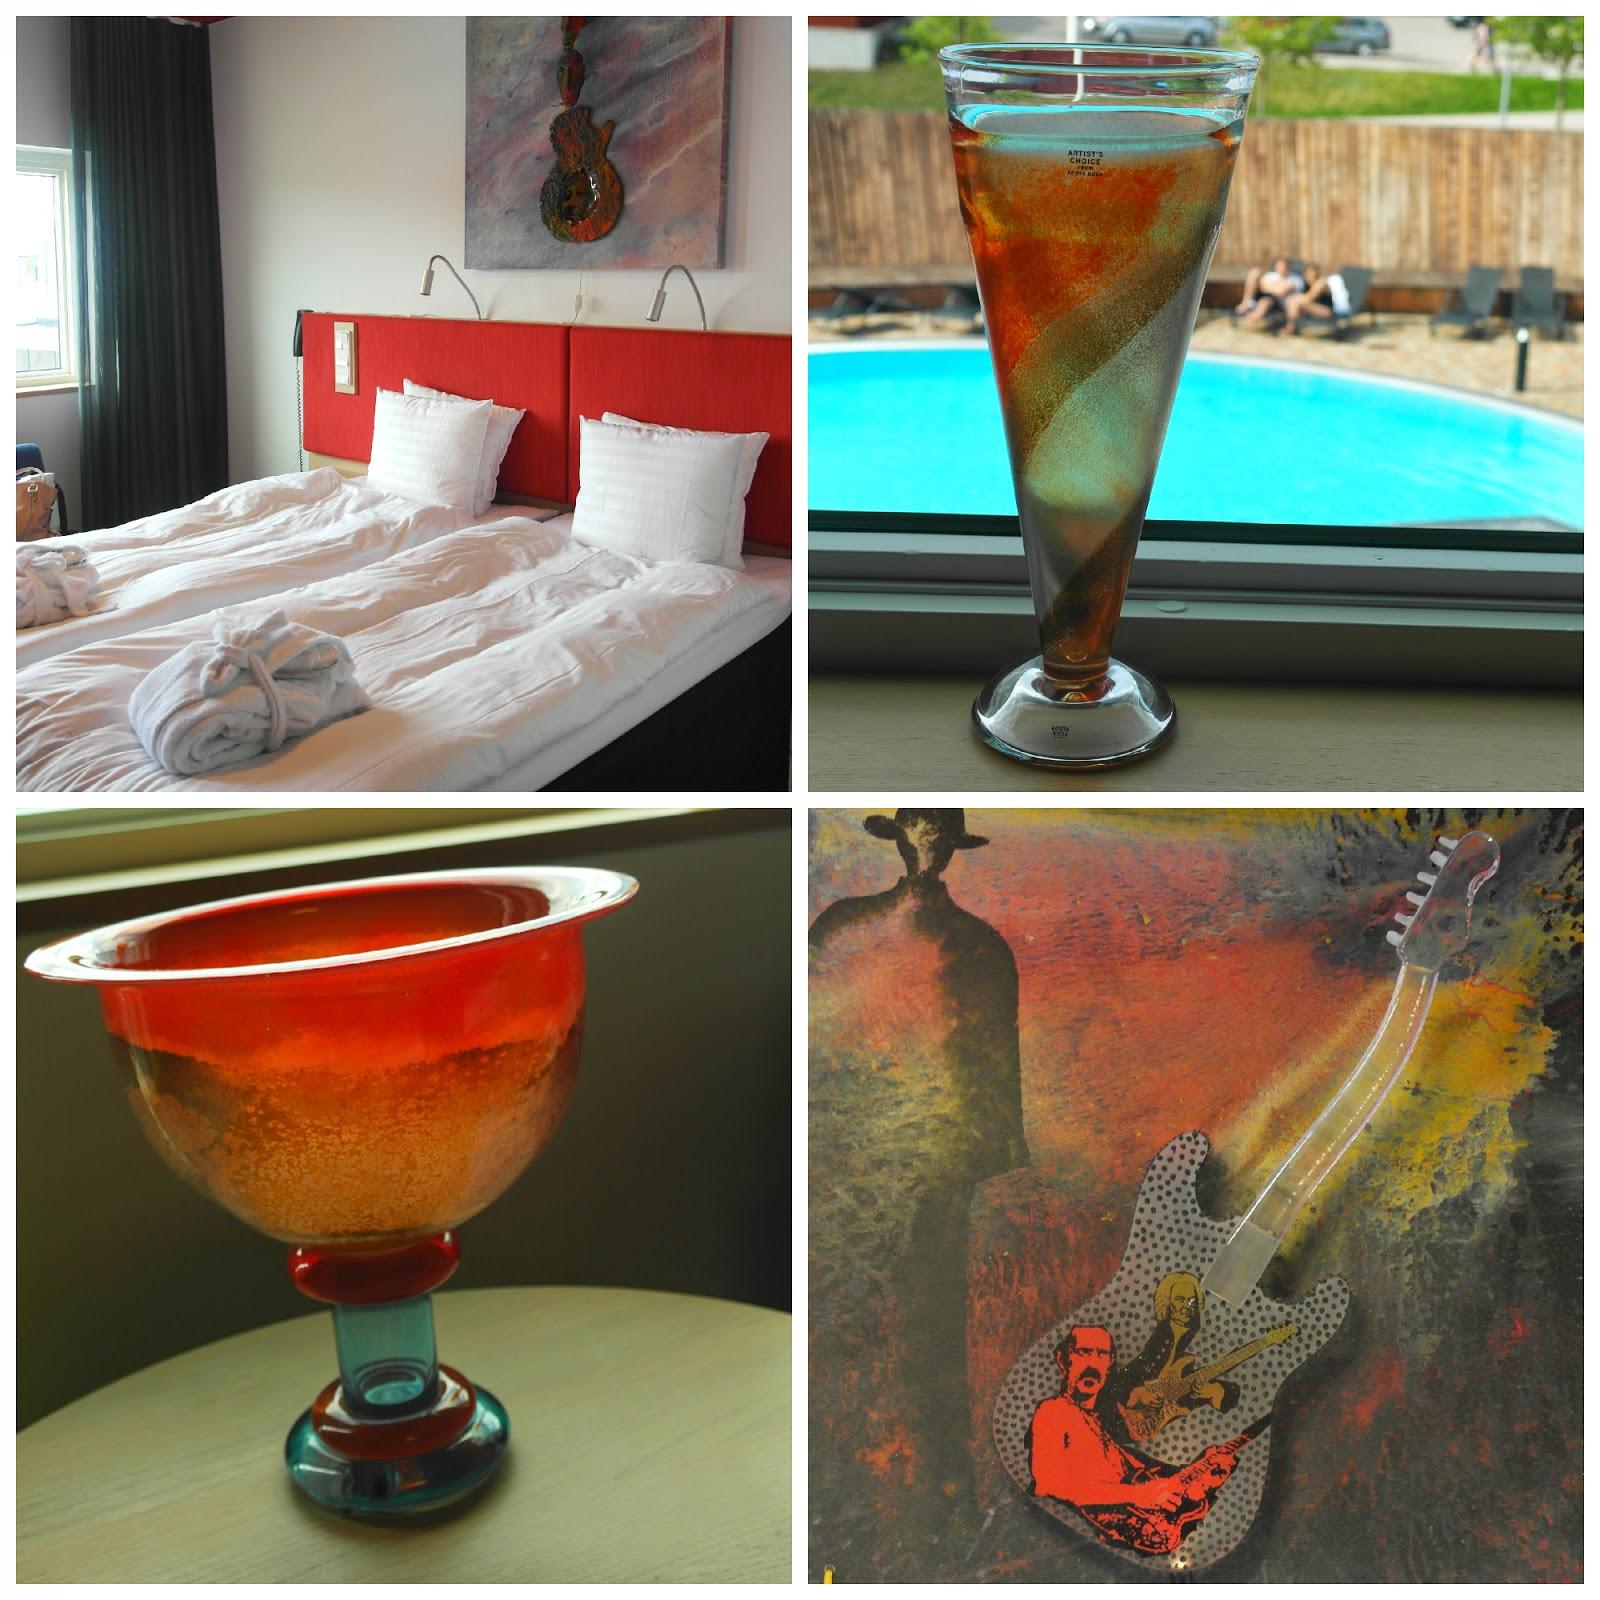 Kosta Boda art hotel room